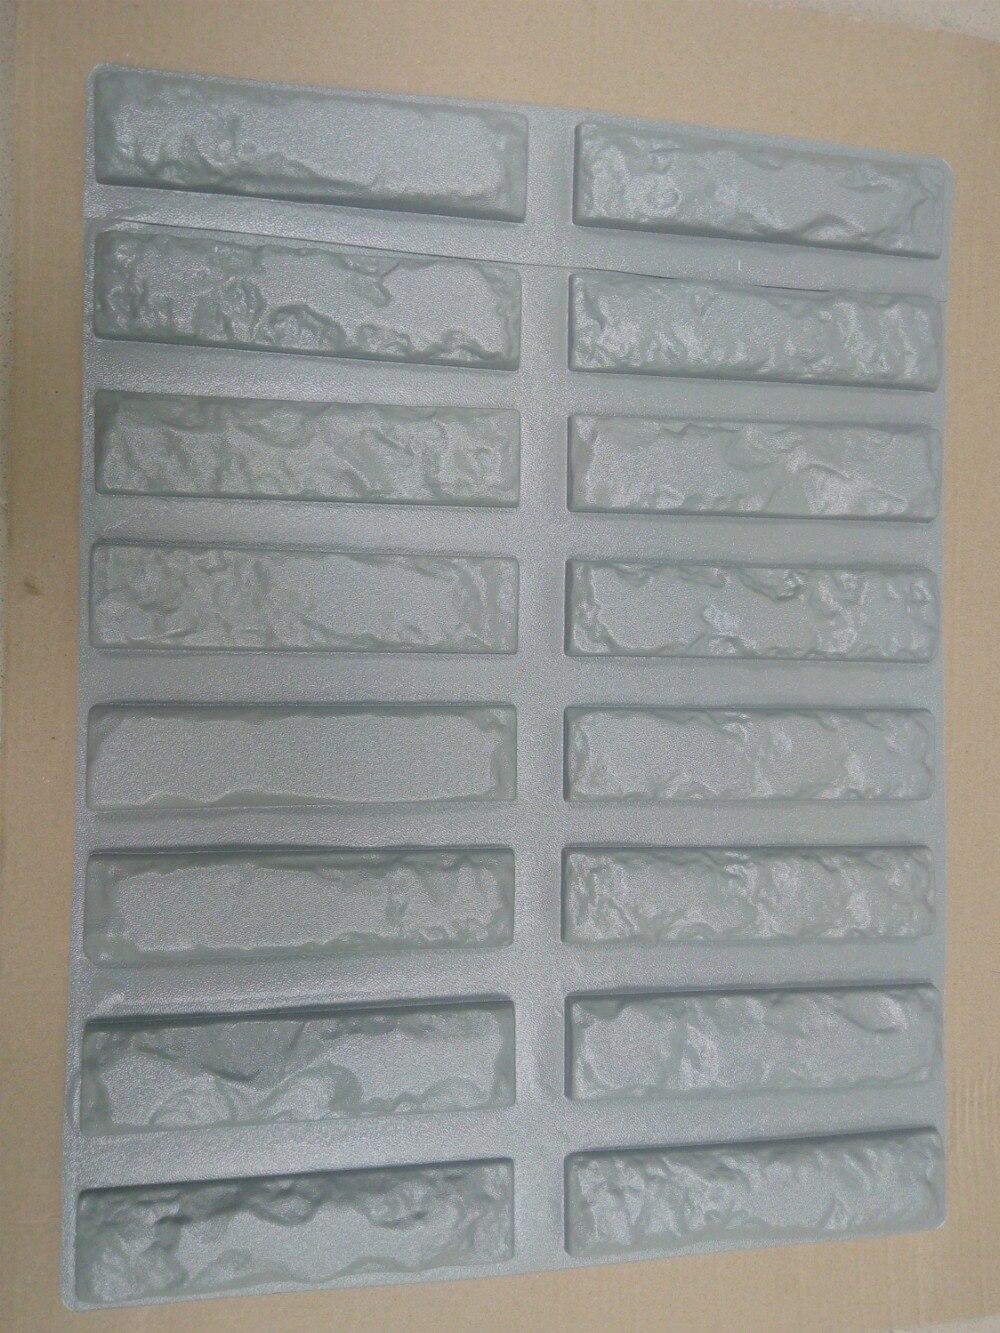 16pcs Plastic Molds for Concrete Plaster Super Best Price Wall Stone Cement Tiles old Brick Decorative